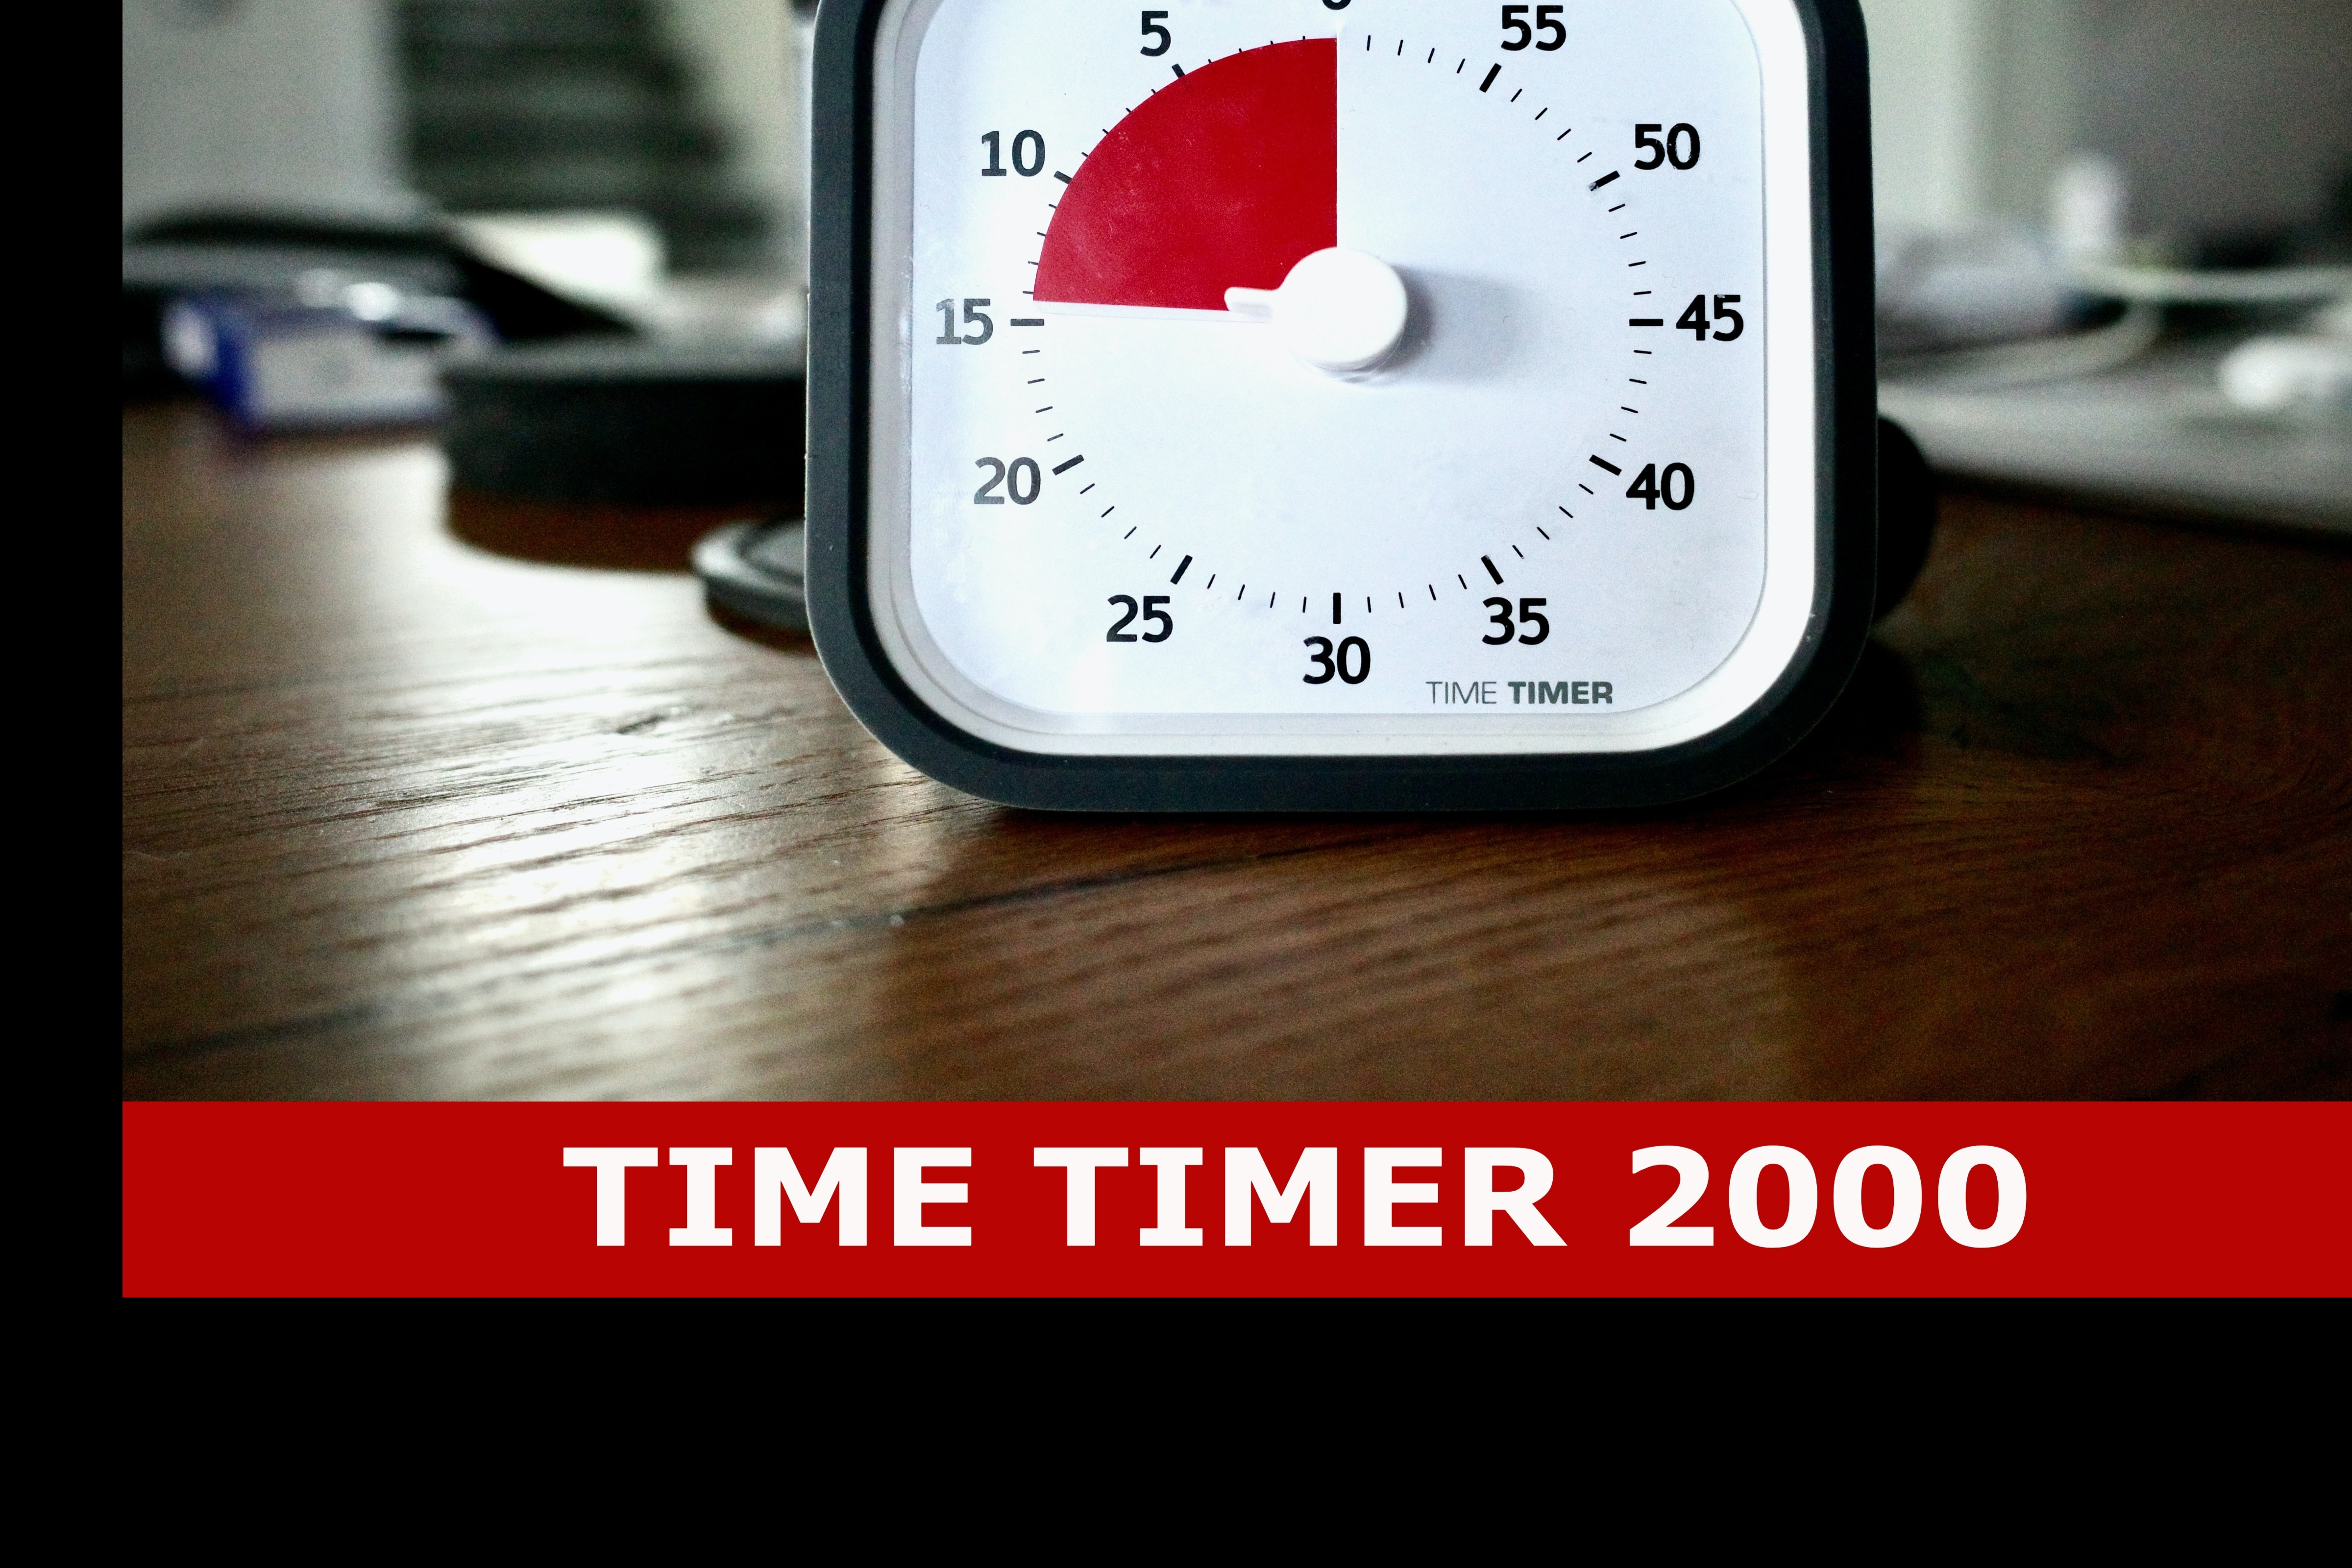 Time Timer 2000